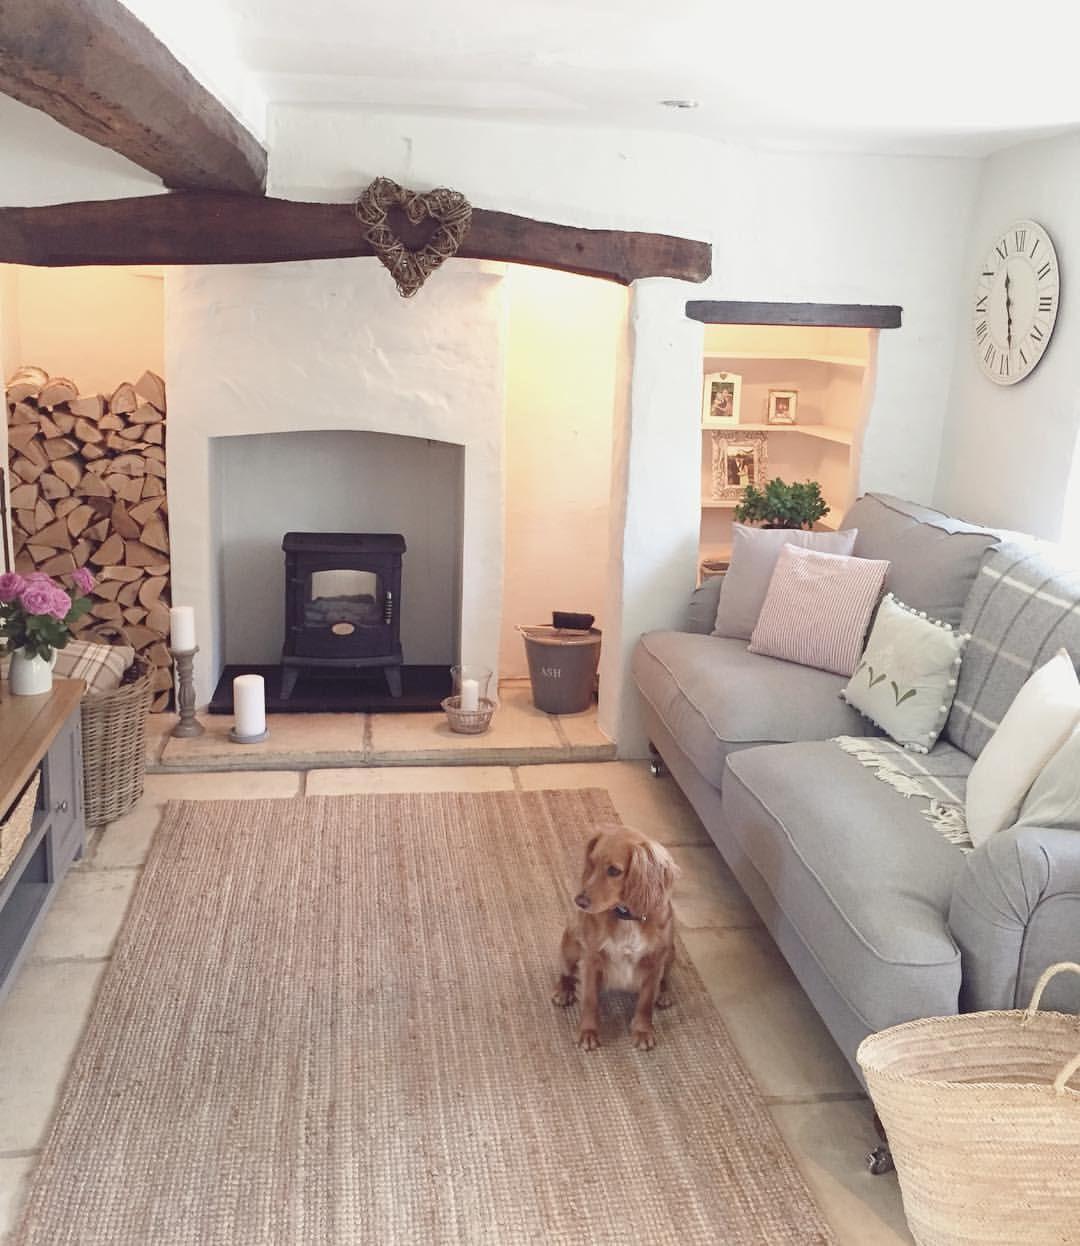 Country Cottageinterior Design Ideas:  Cottage Life & Interiors